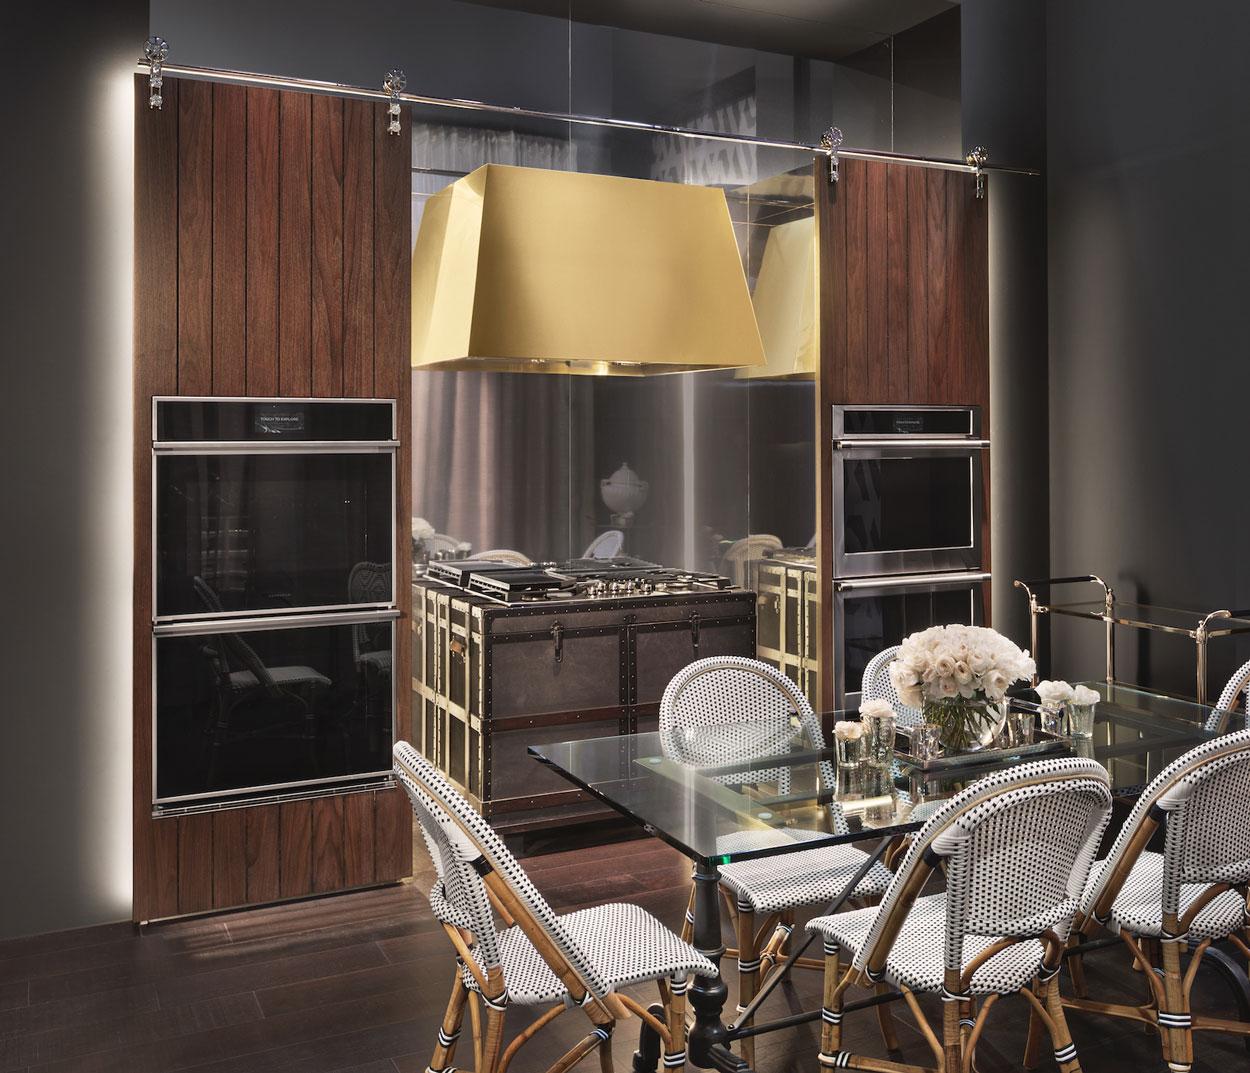 Custom Hoods & Kitchen Ventilation Options - Bentwood Luxury Kitchens